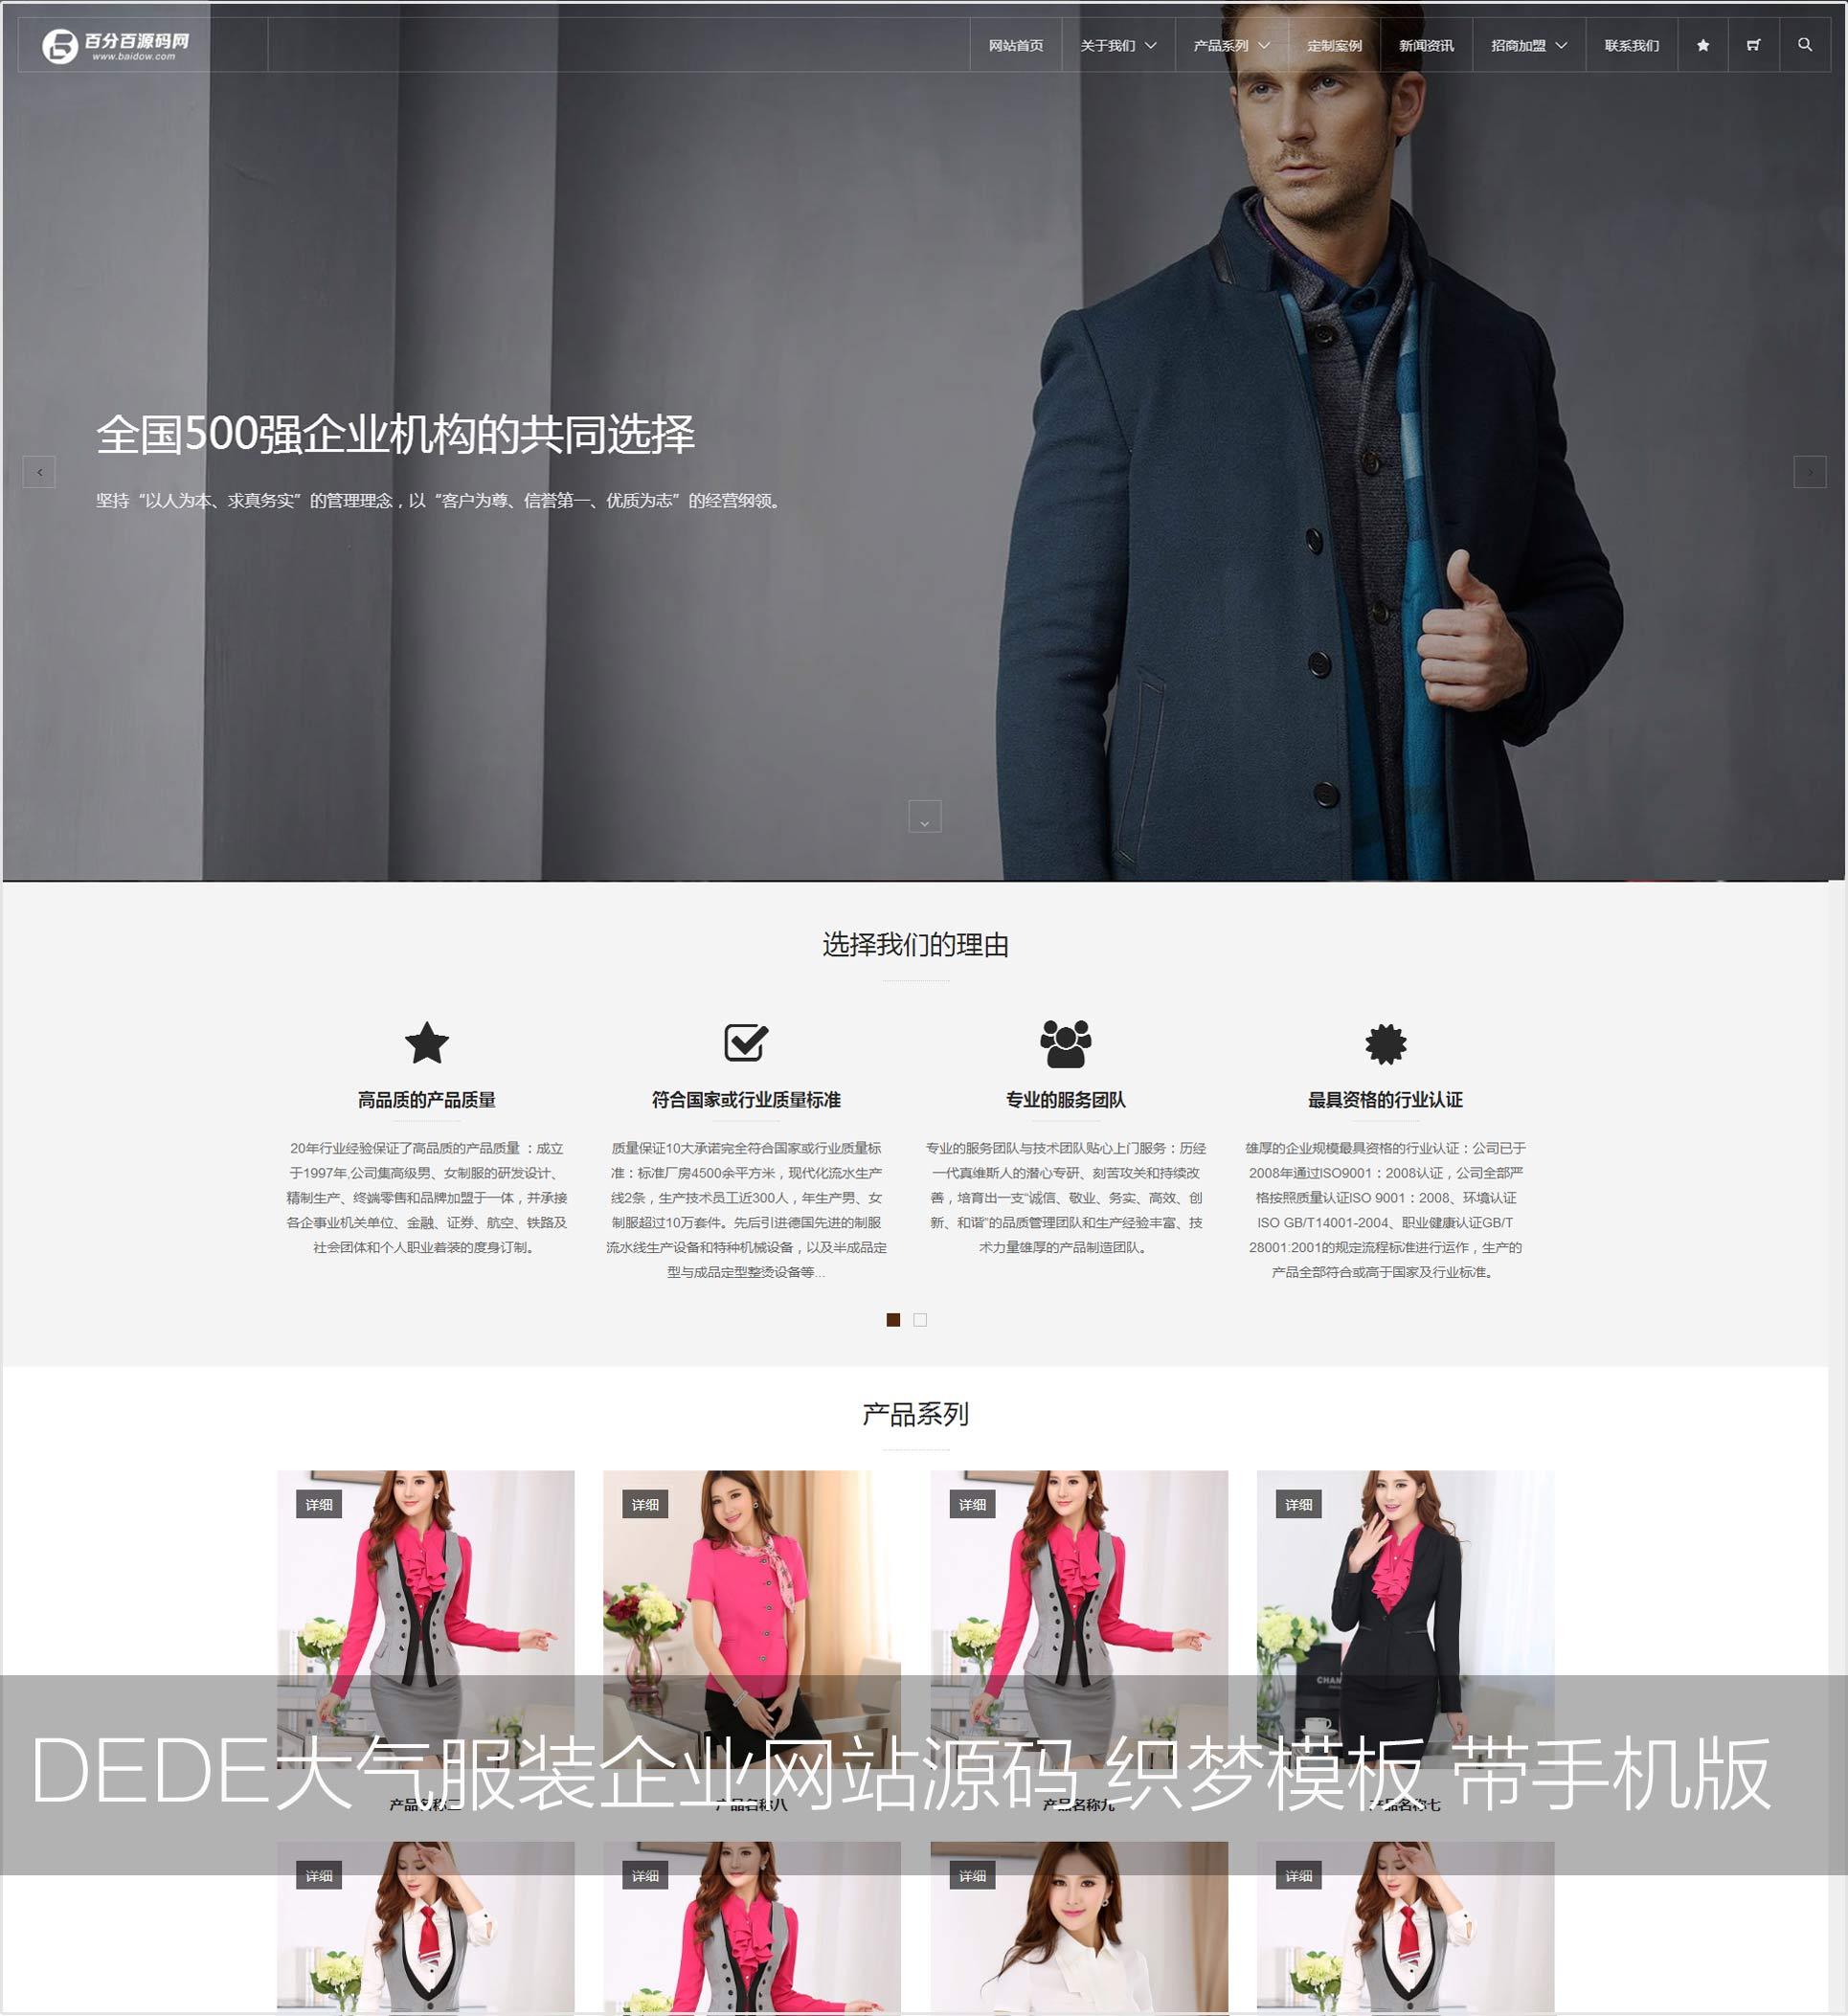 DEDE响应式服装网站源码 织梦CMS男女装定制类网站模板带WAP